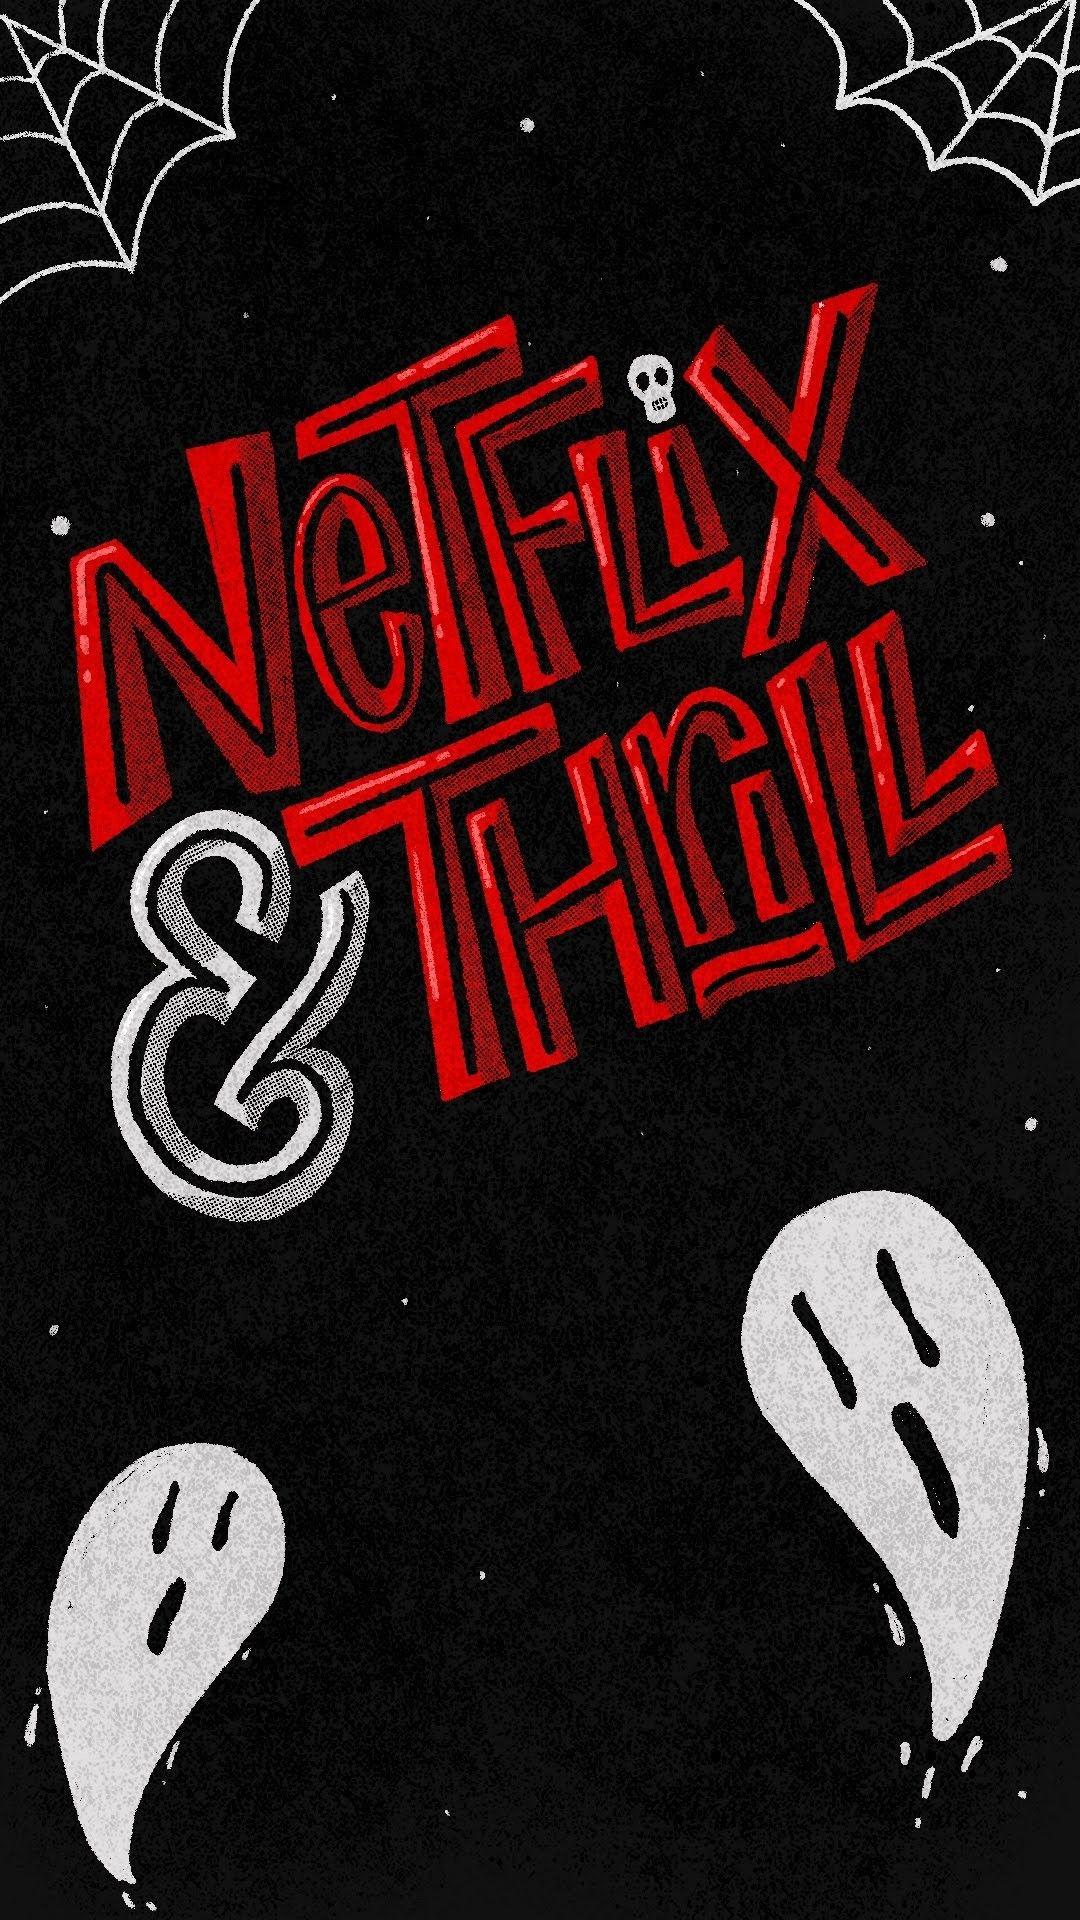 This weekend, let's NetflixandThrill netflixoriginal